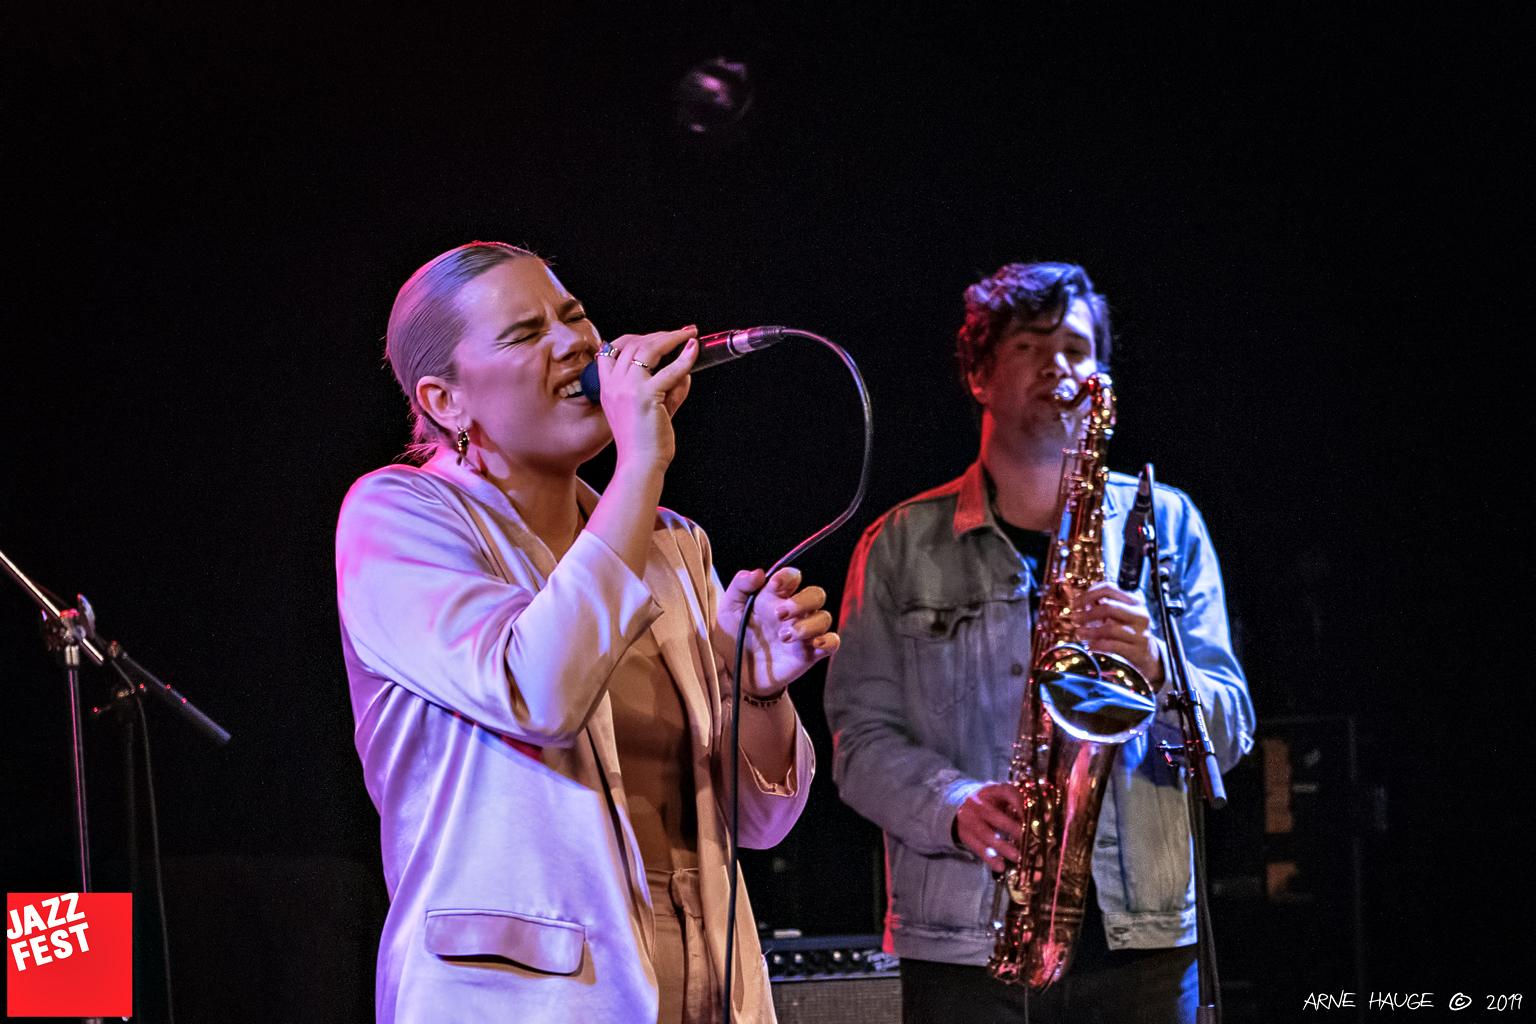 190510 Natalie Sandtorv (Jazz Expo) @ Dokkhuset - foto Arne Hauge_011.jpg